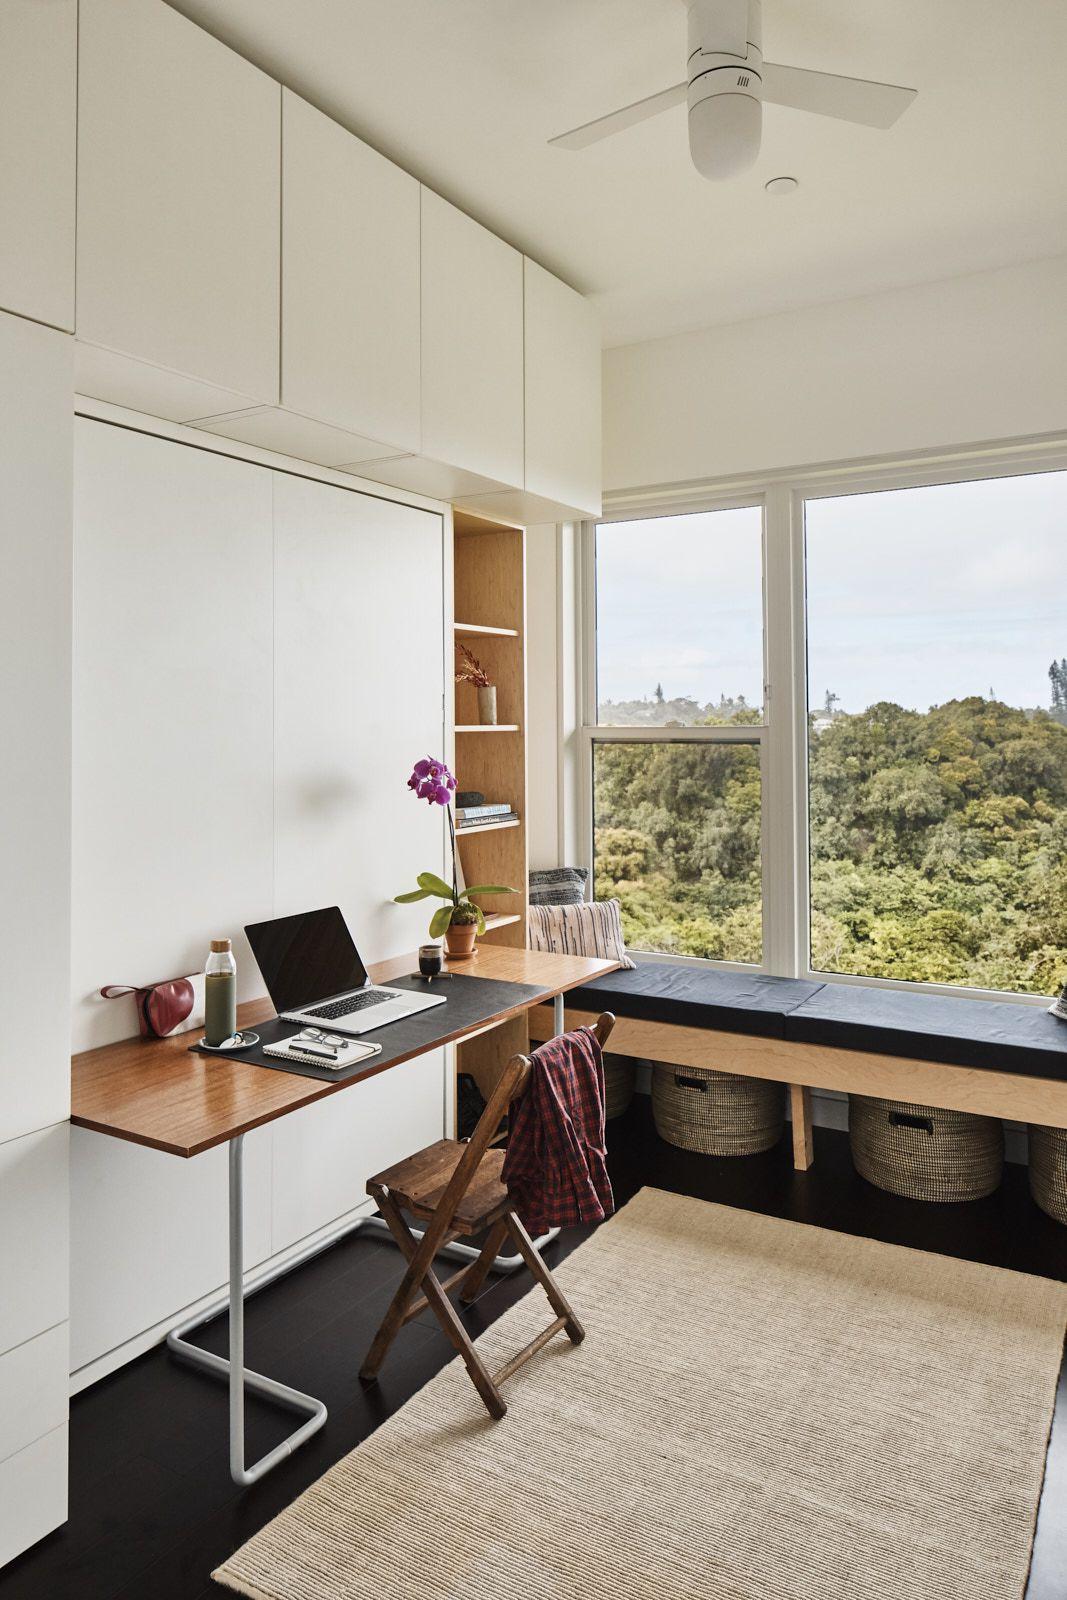 Interior room with desk